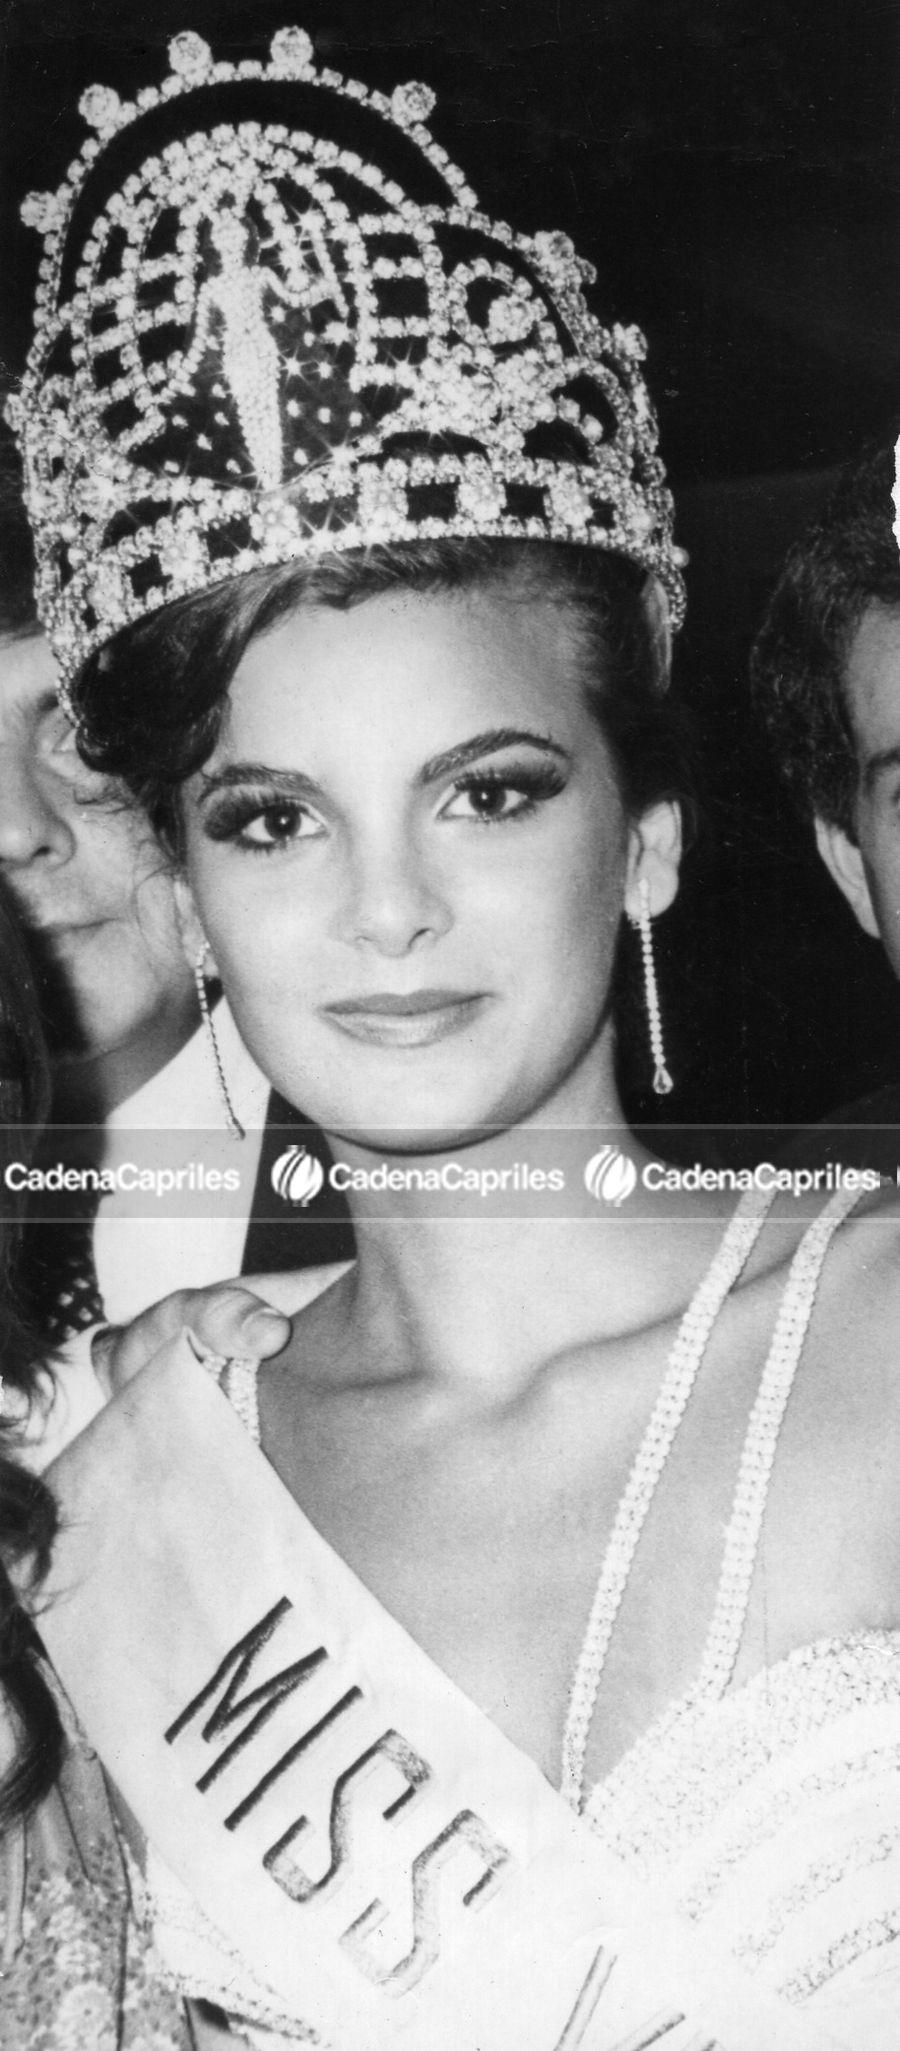 maritza sayalero, miss universe 1979. Ce313b10